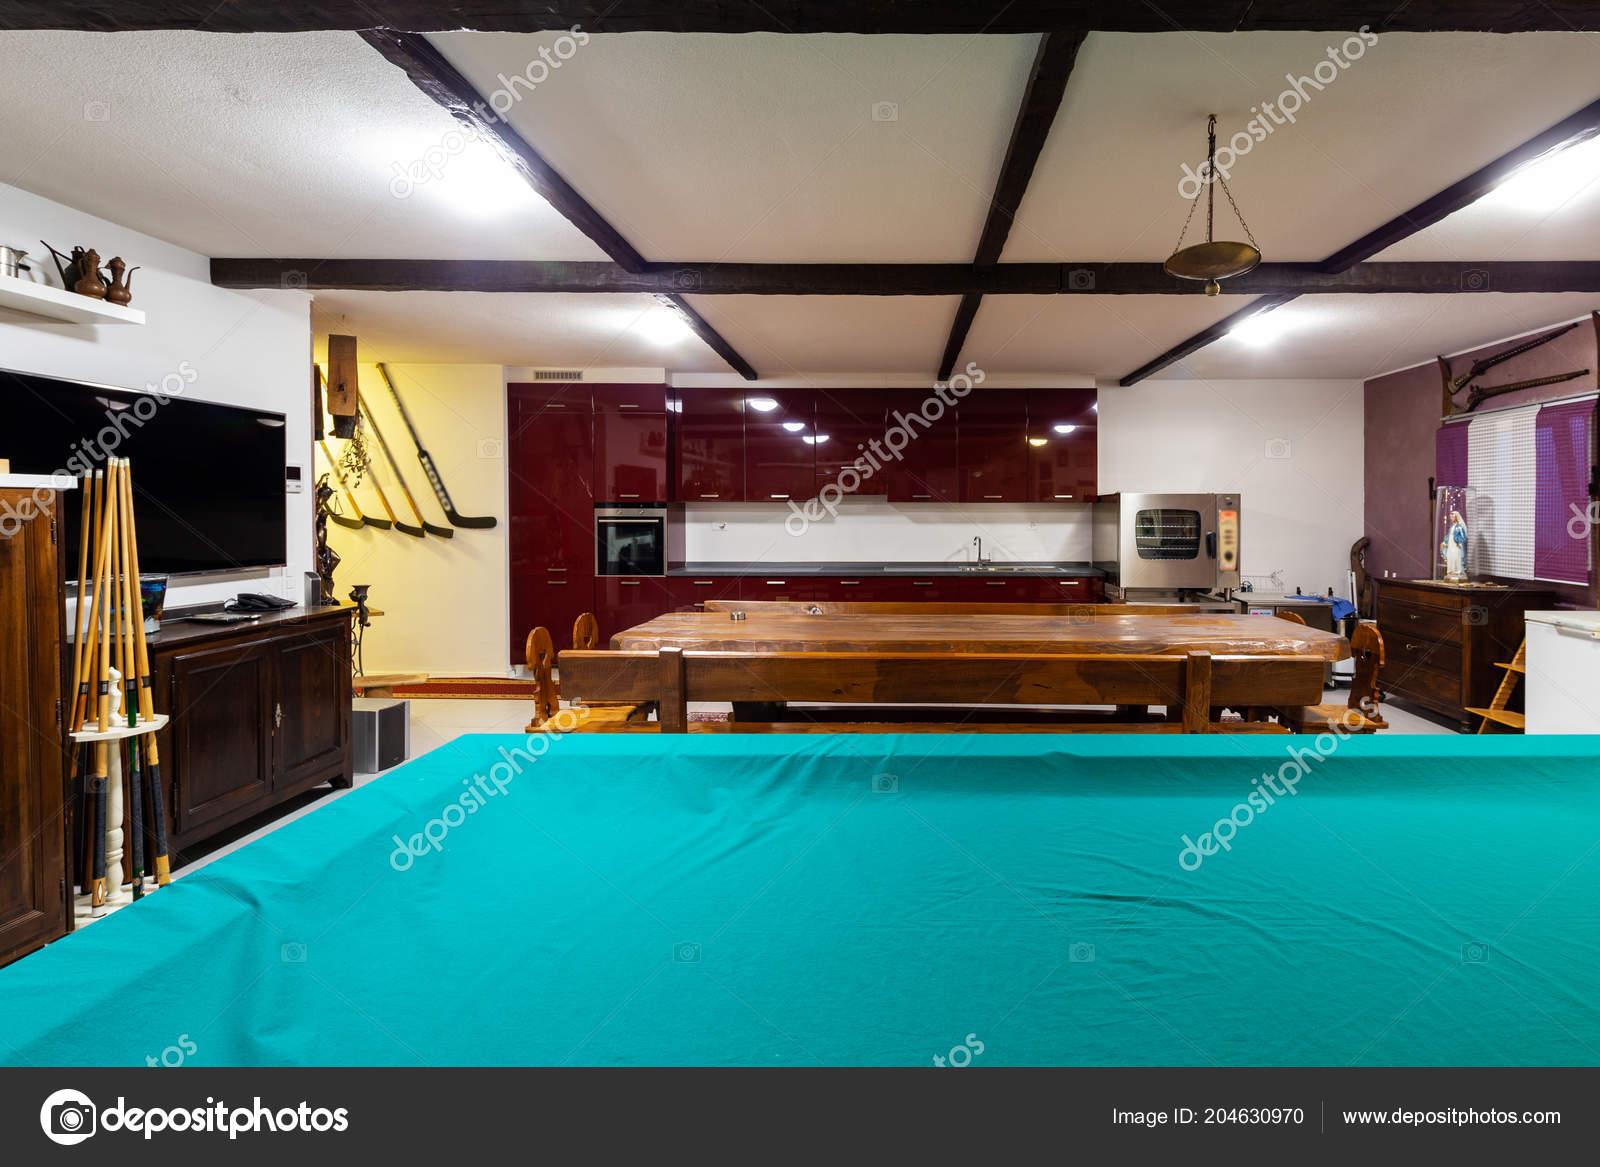 kitchen bistro table led ceiling lights 小酒馆在一个大木桌的私人房子里面没人 图库照片 c zveiger 204630970